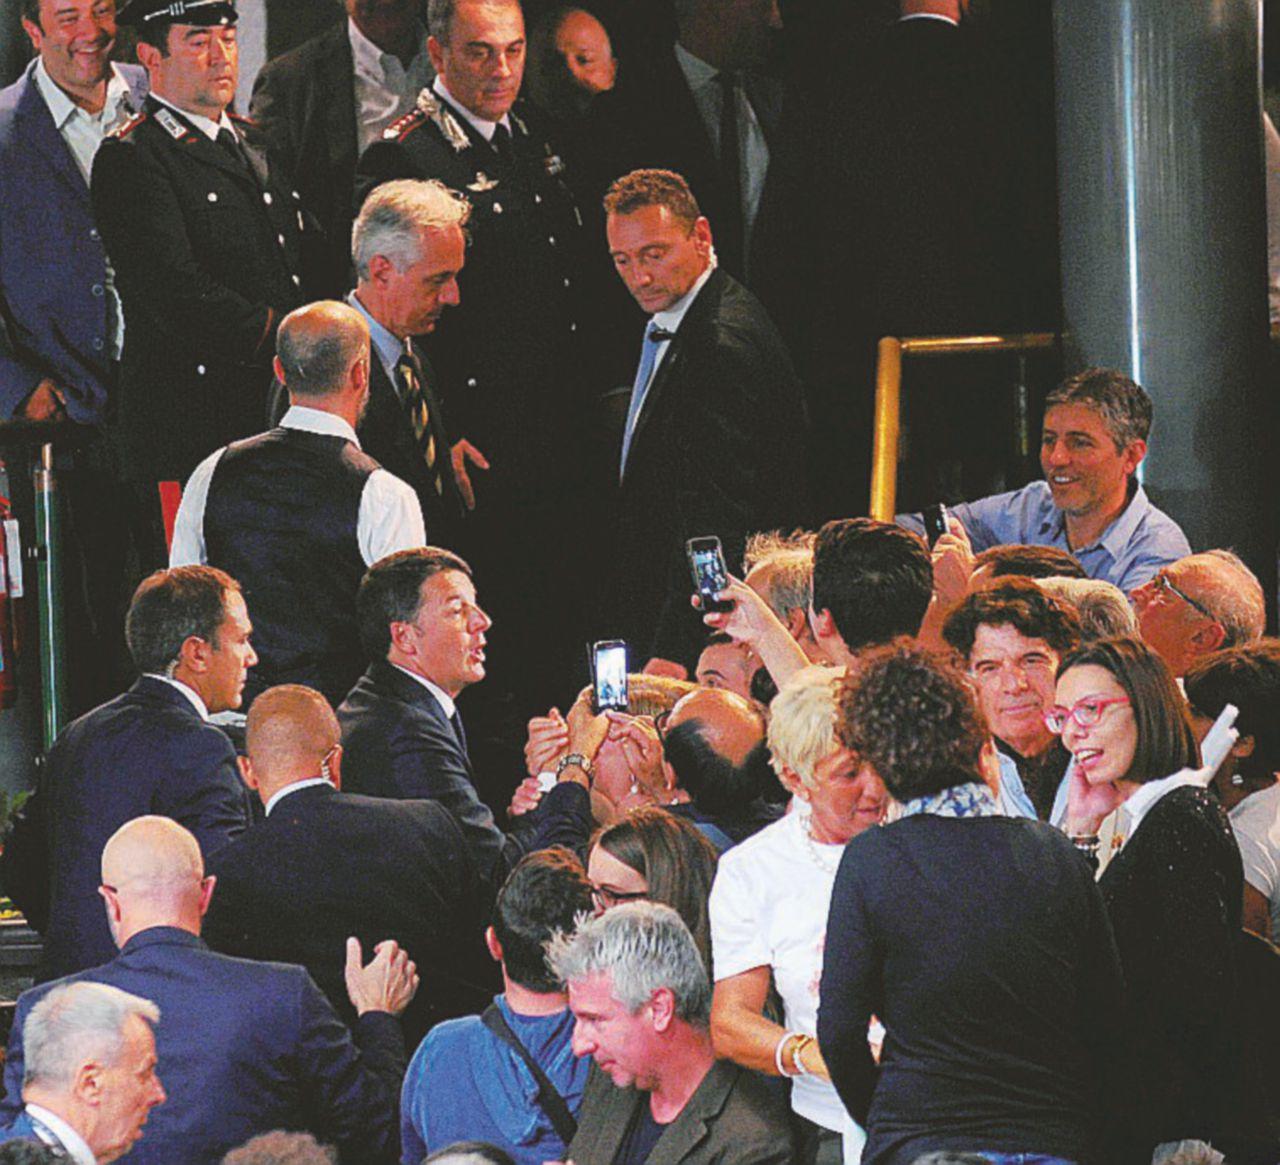 Sala mezza vuota per Renzi a Firenze. Il Sì non funziona